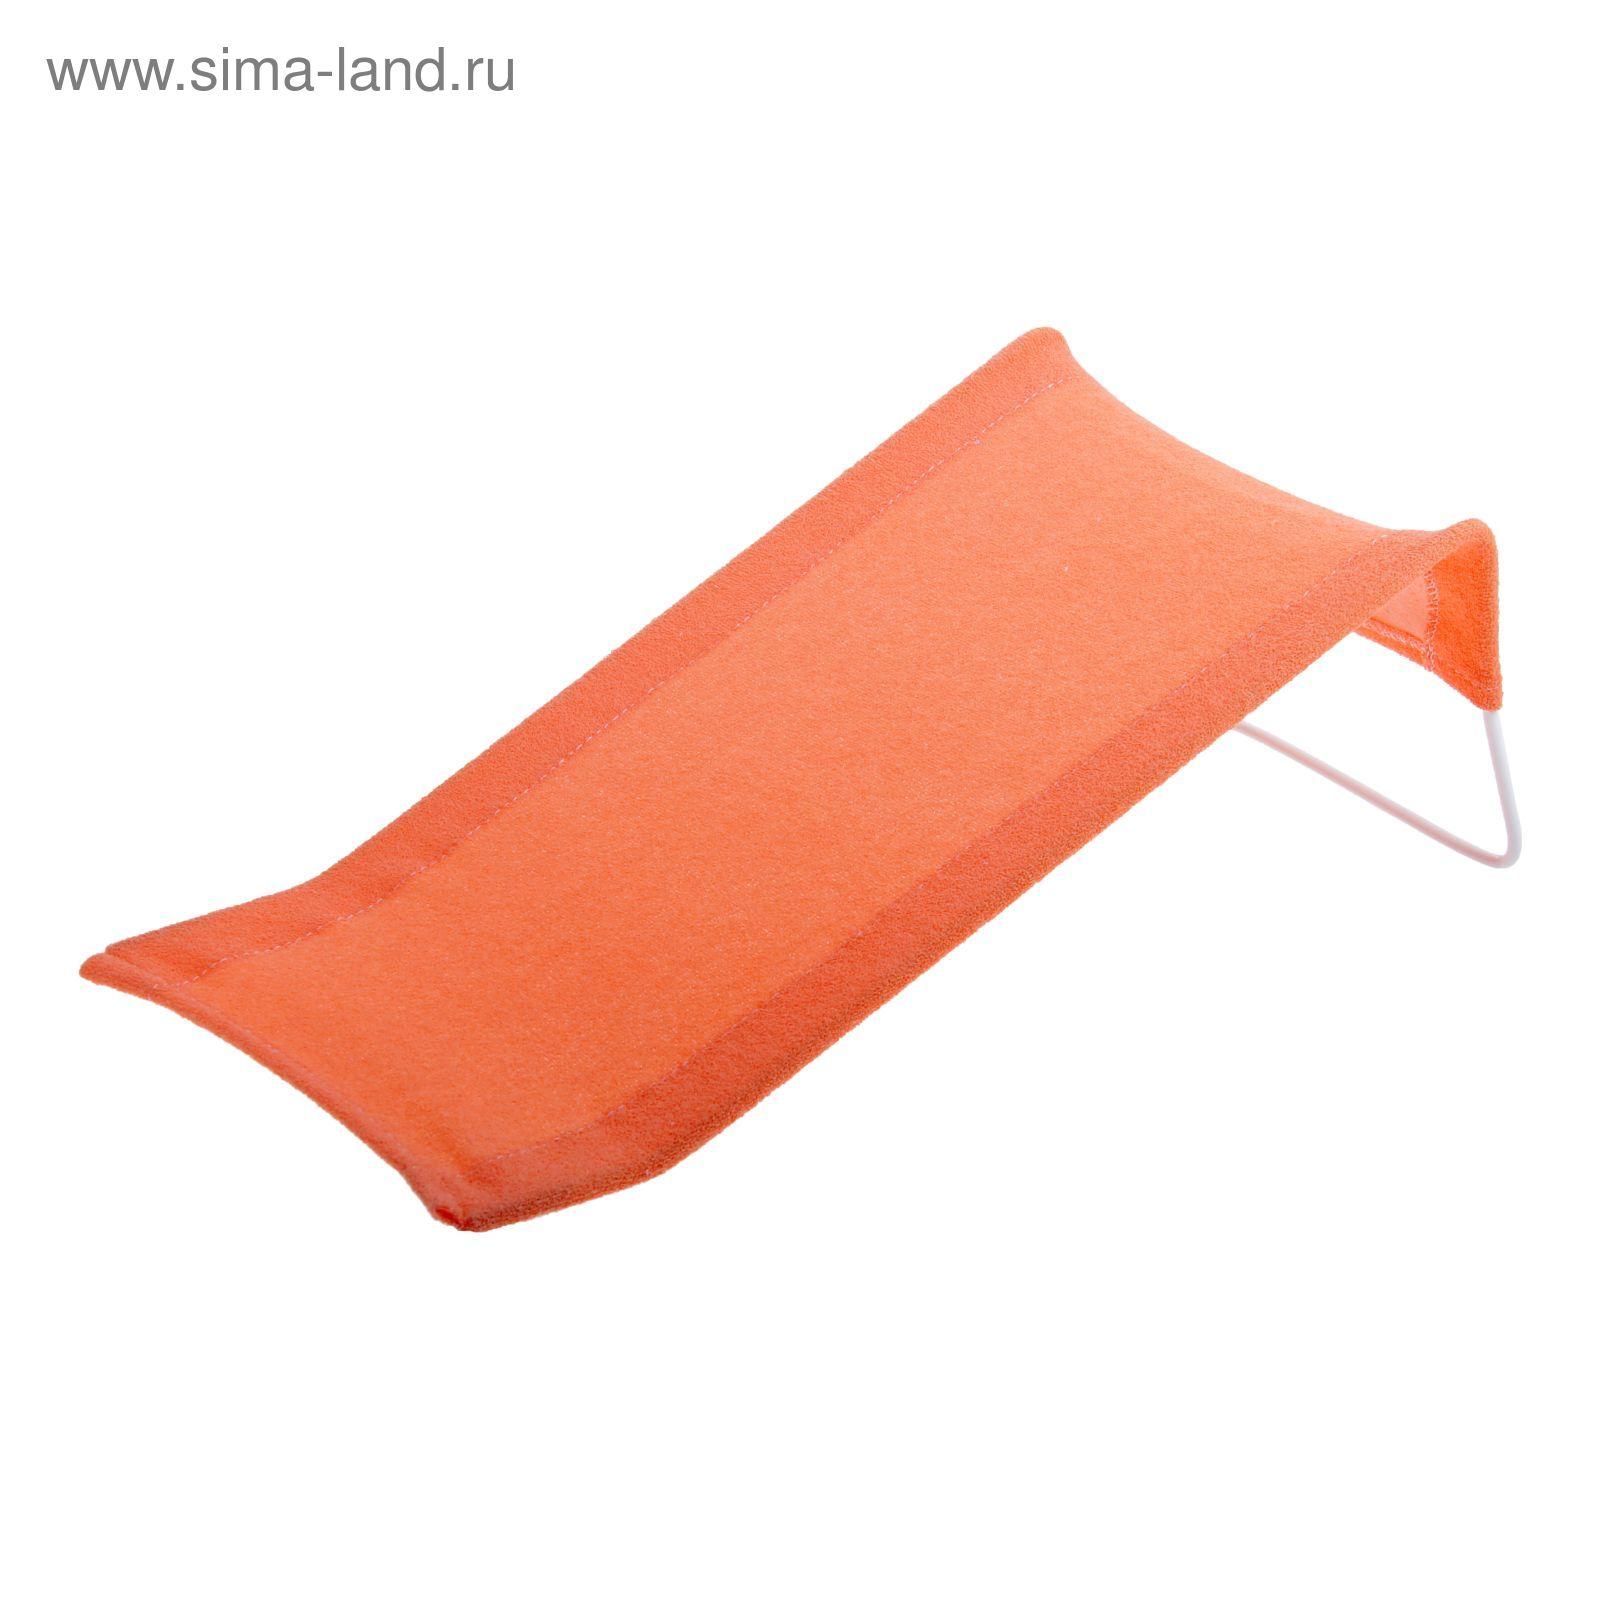 Фото цветов морковного цвета